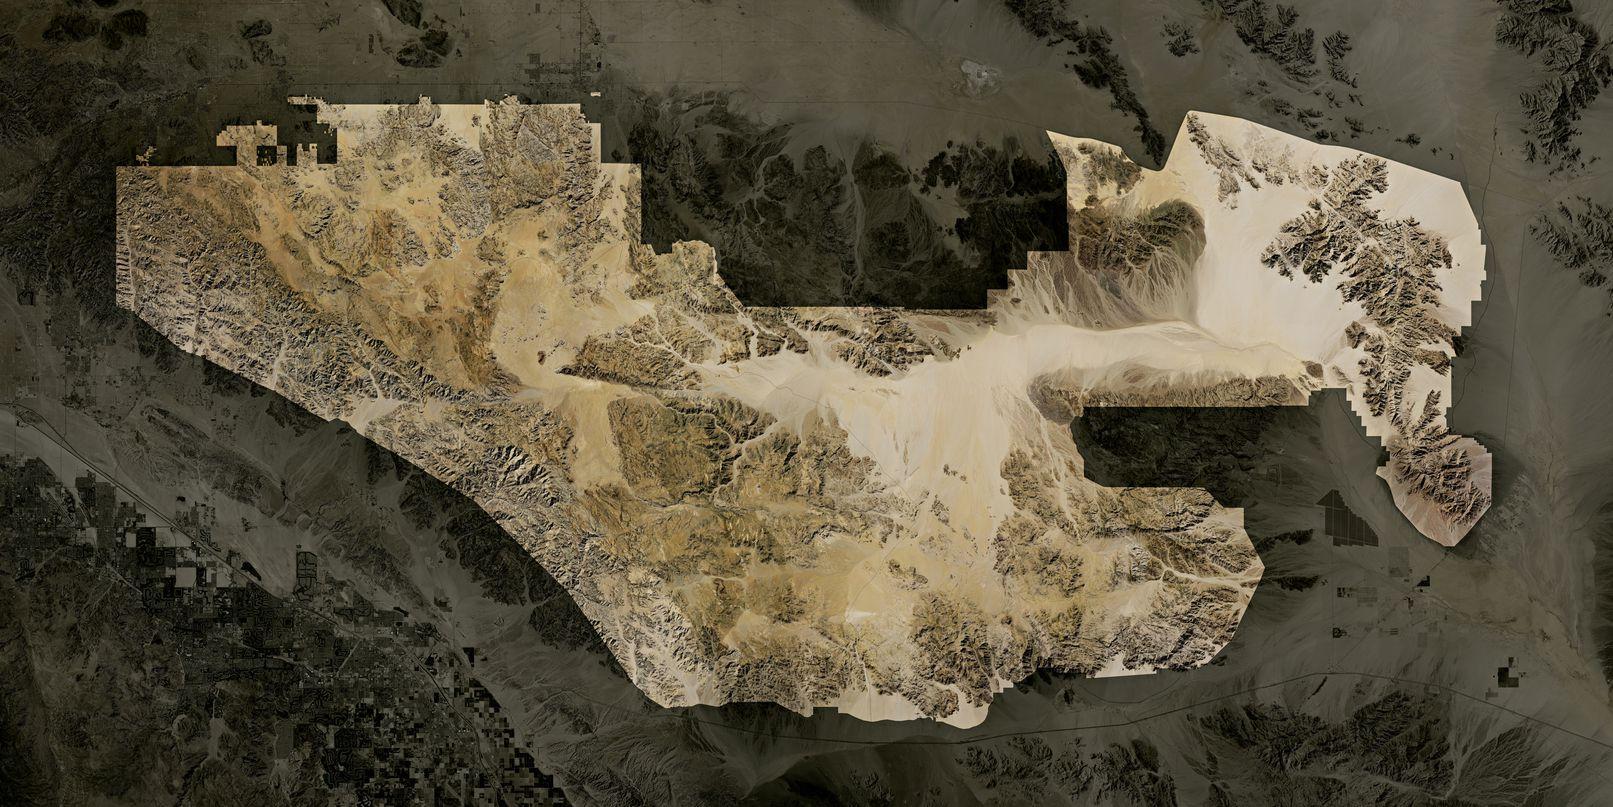 Map of Joshua Tree National Park